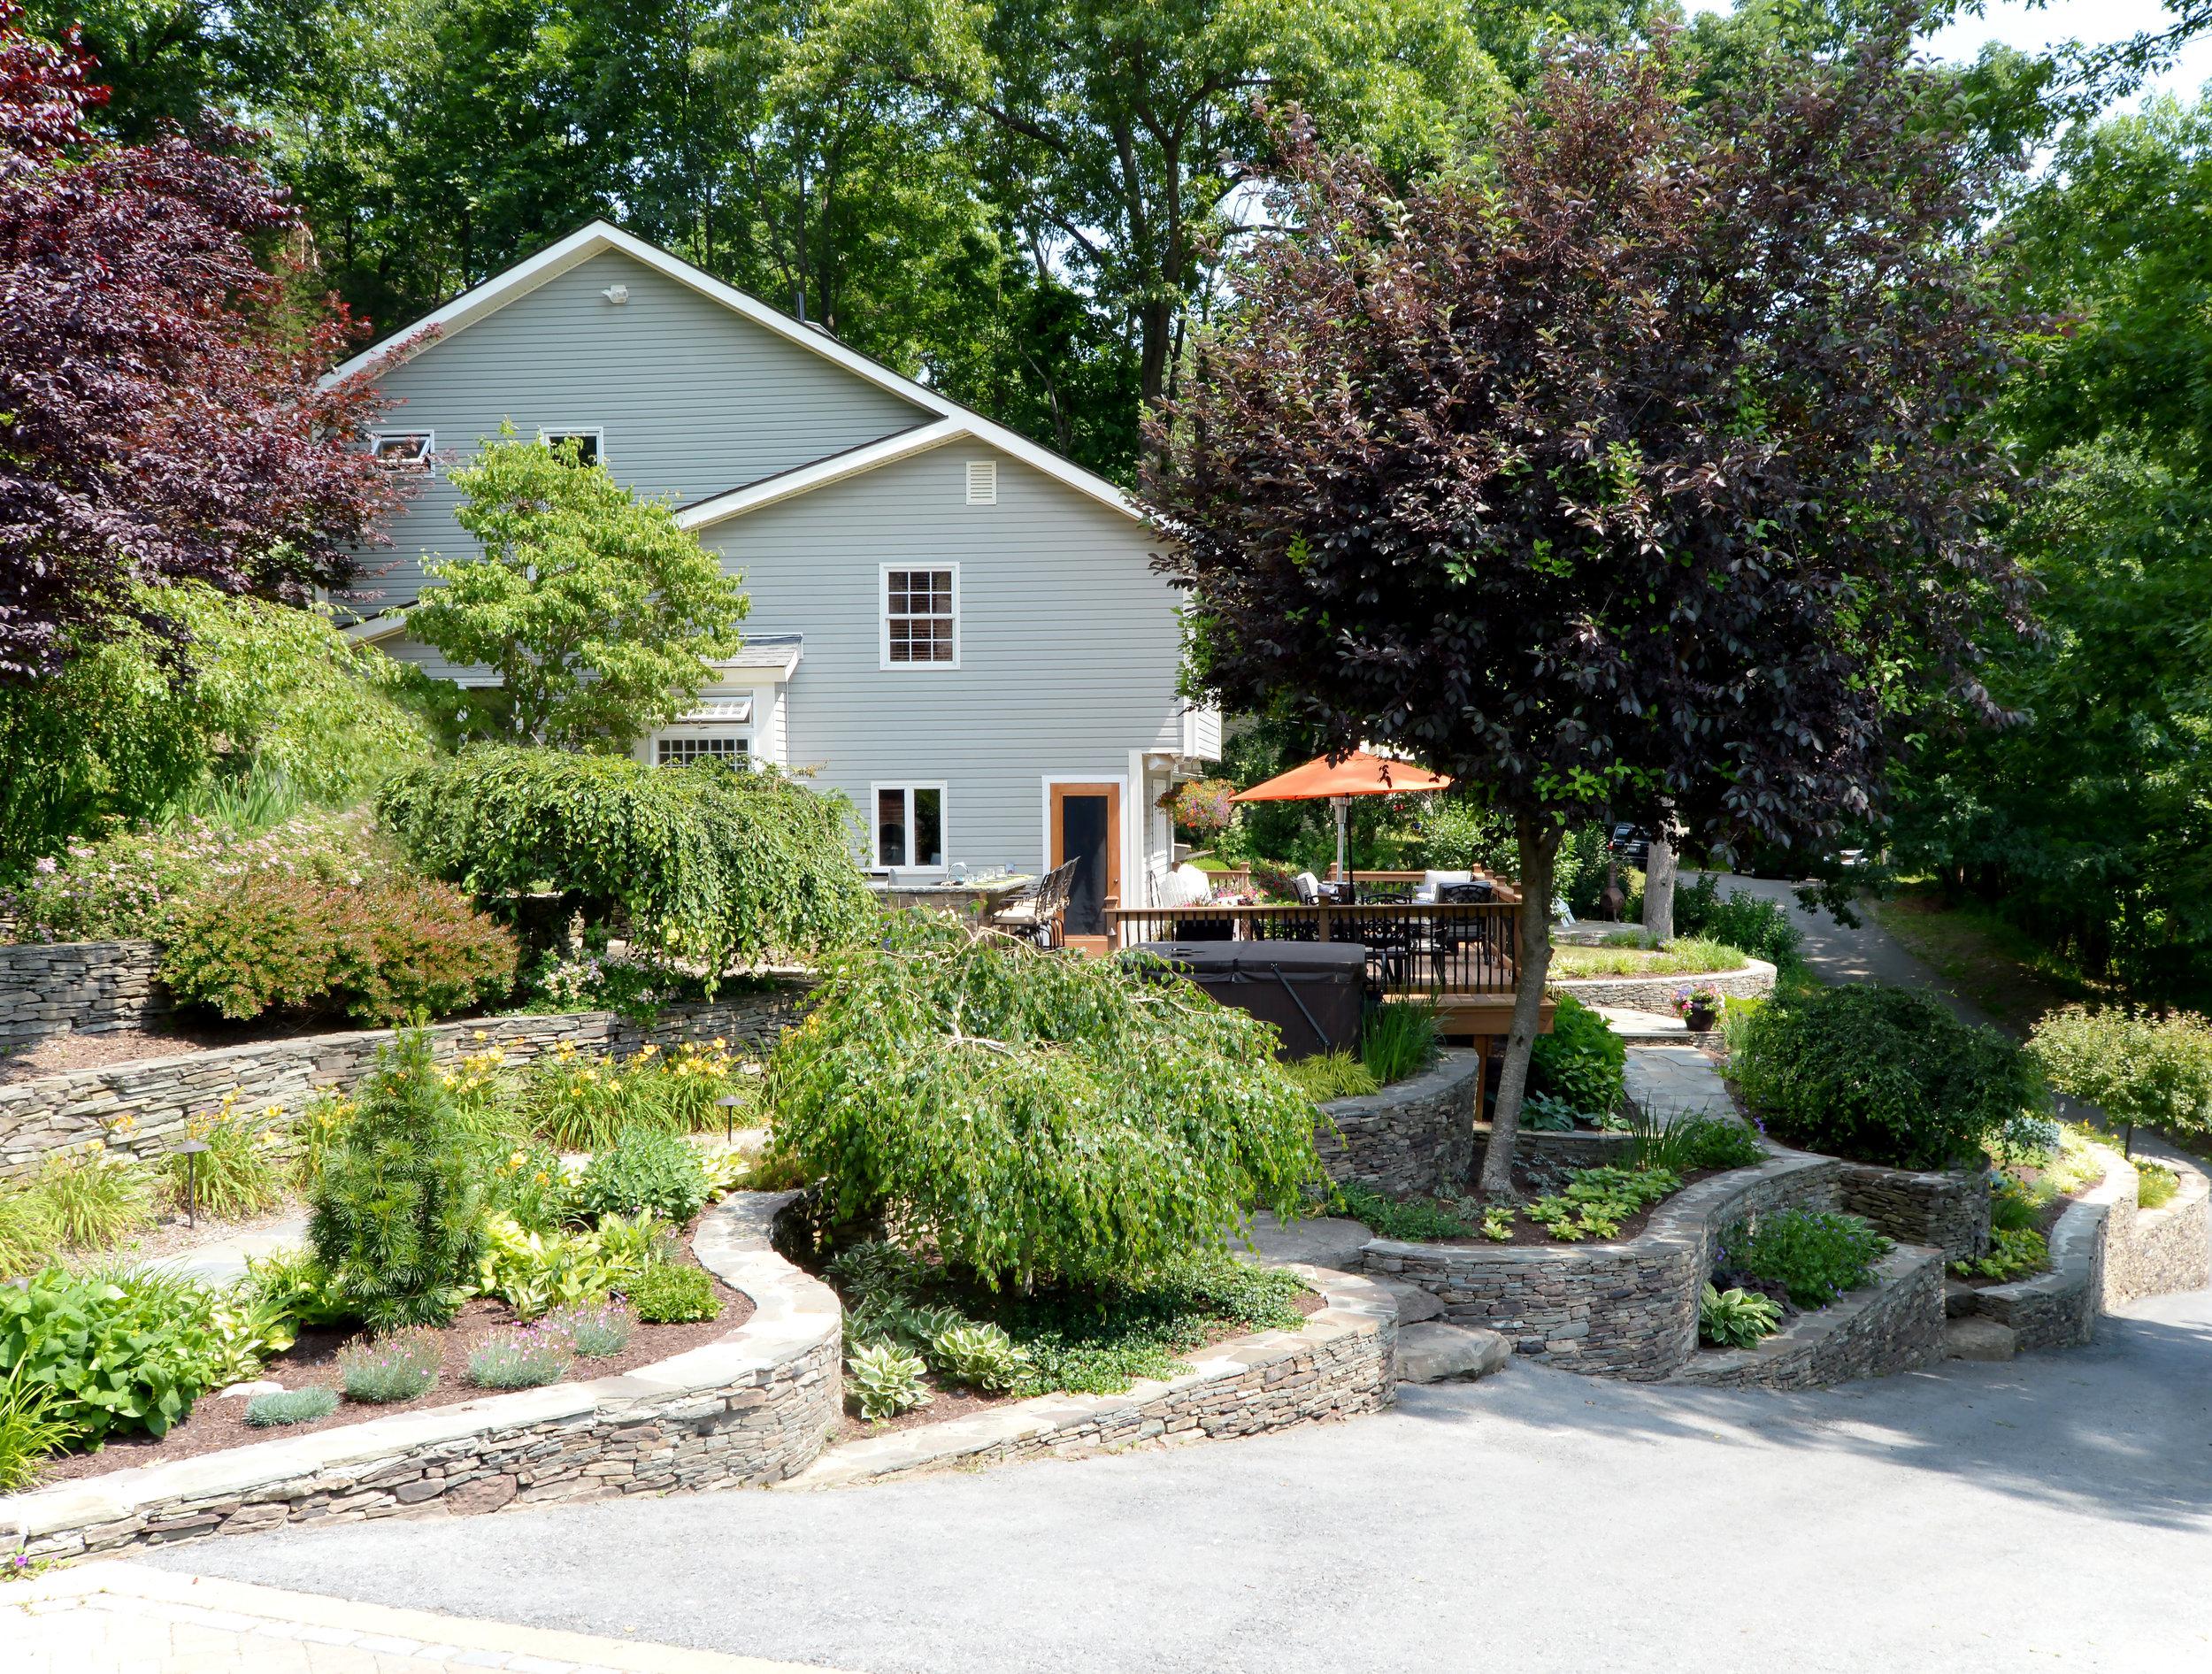 6 Landscaping Ideas For Sloping Yards Landworx Of Ny Landscape